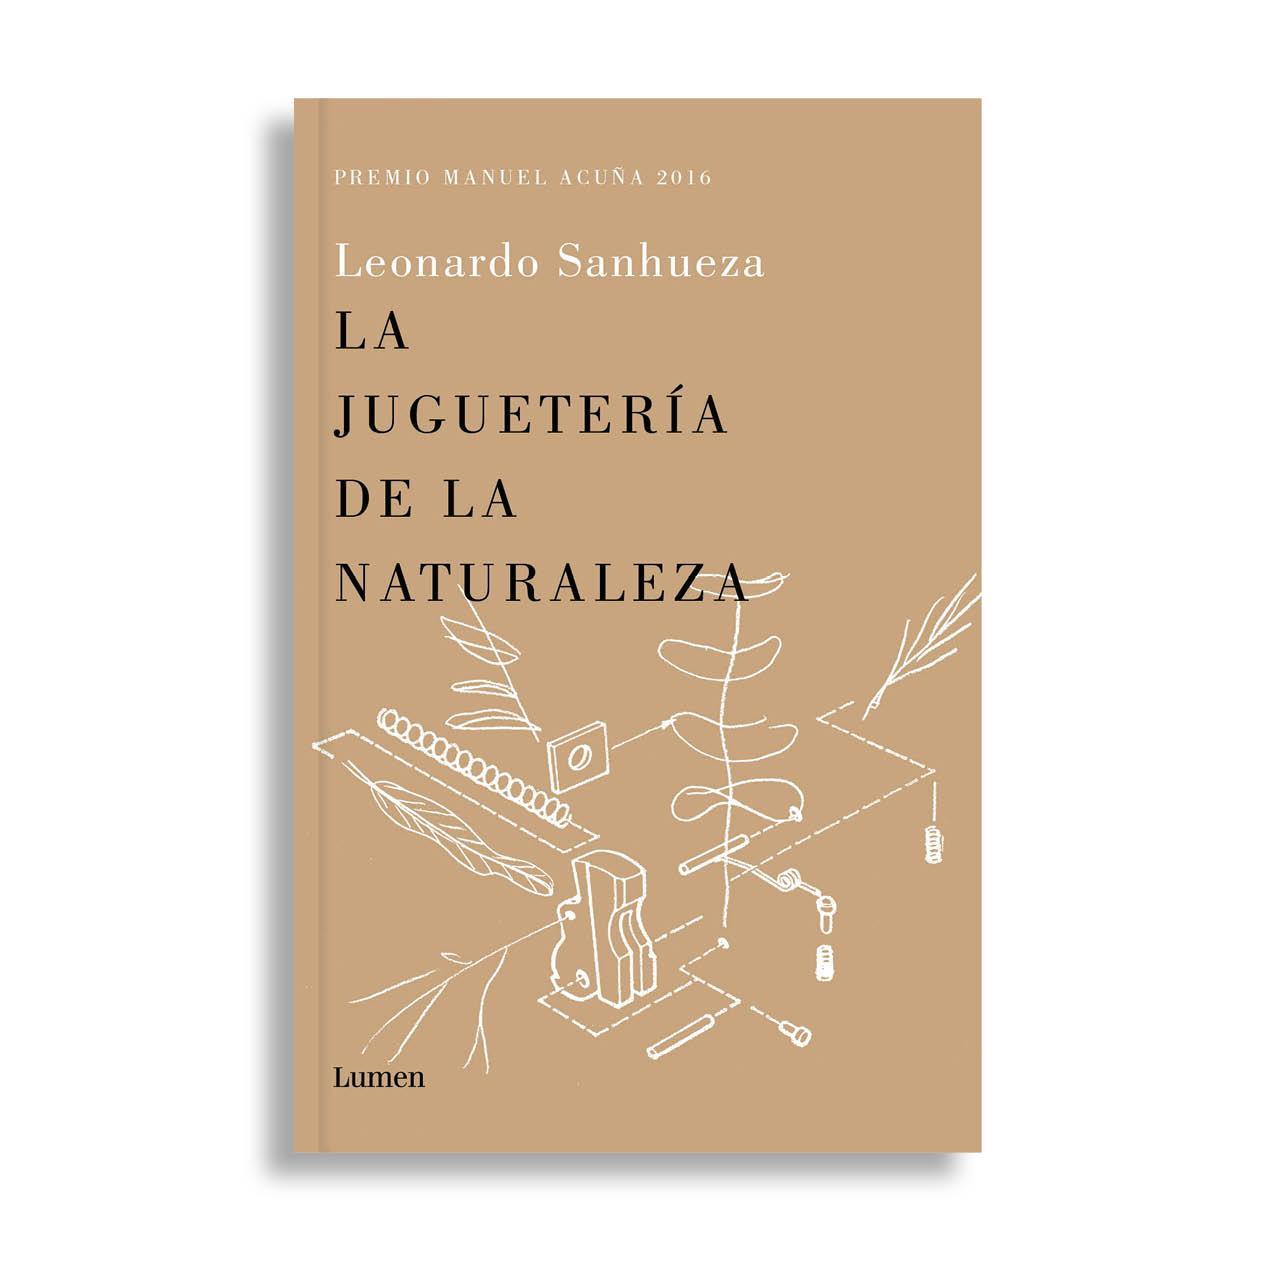 1 DB - Jugueteria 2